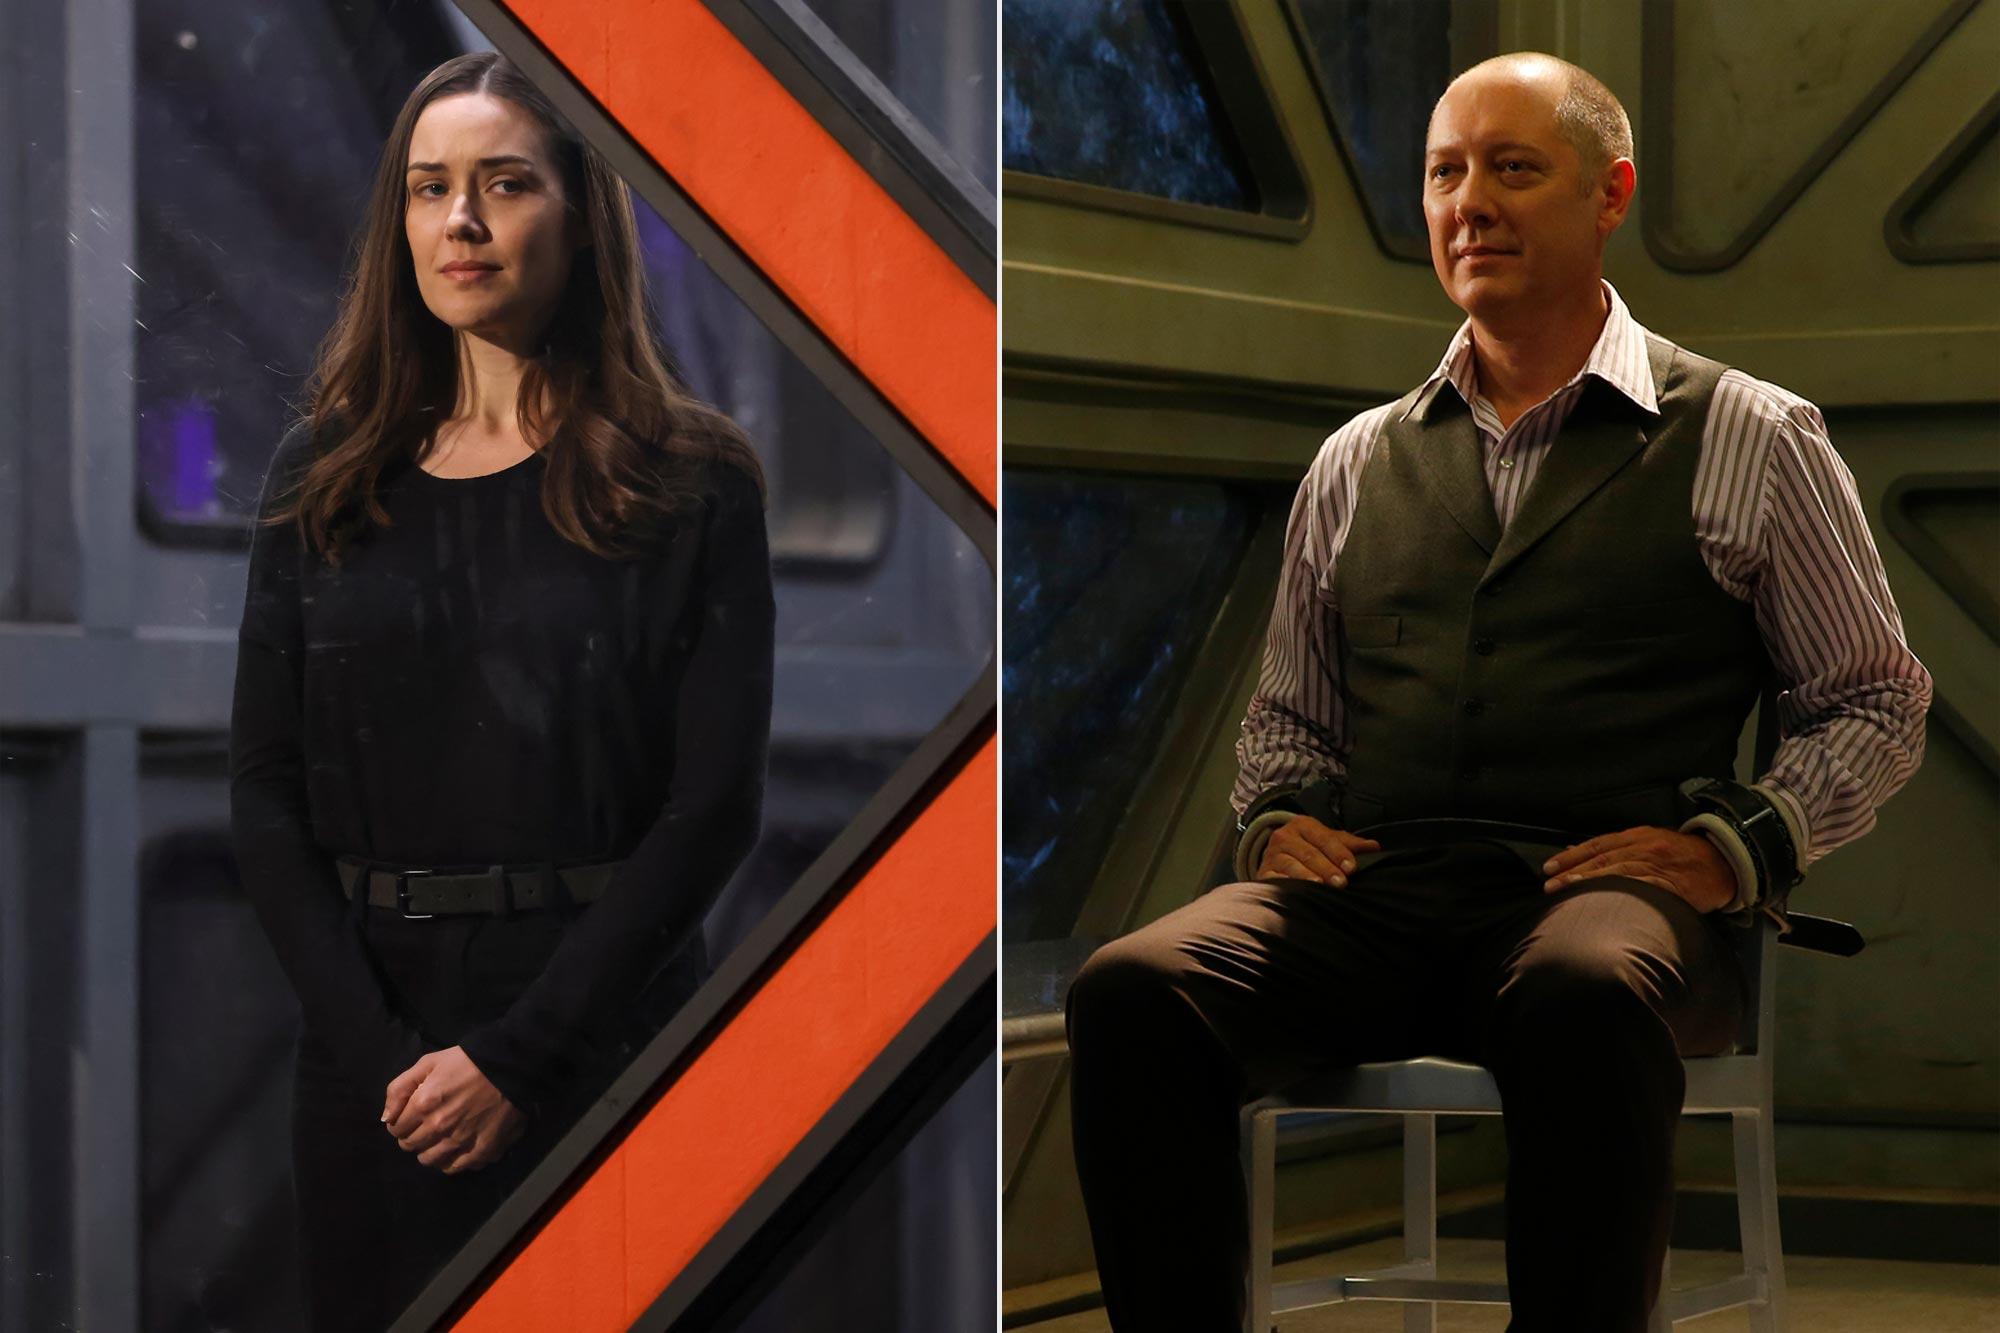 The Blacklist- Megan Boone as Liz Keen; James Spader as Raymond 'Red' Reddington